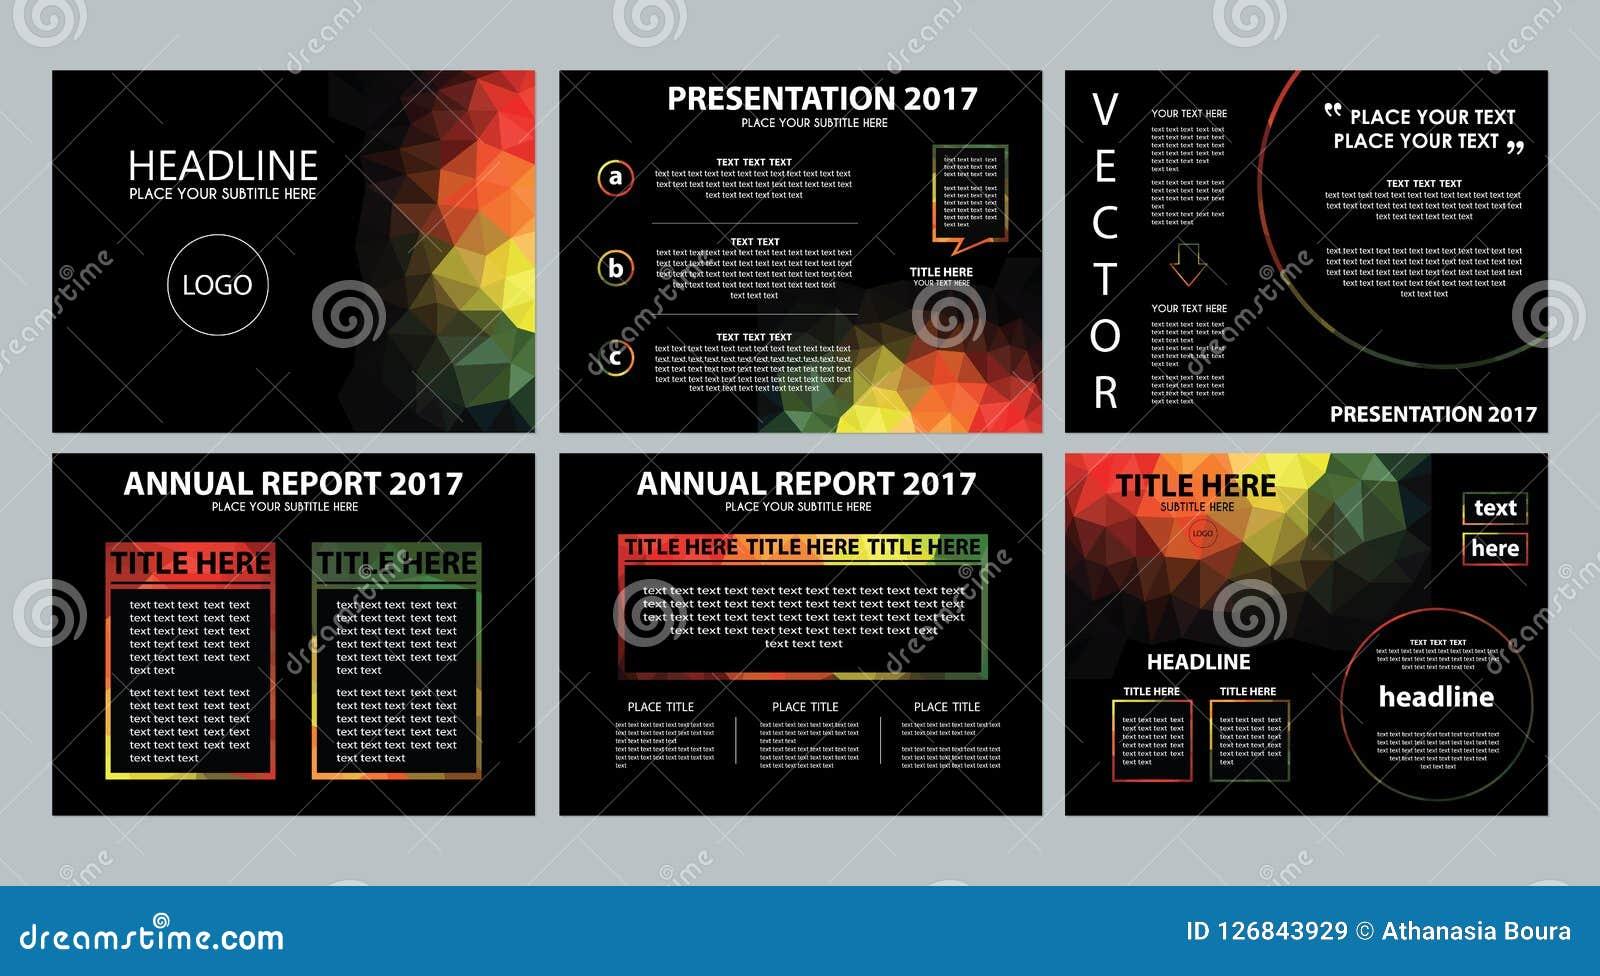 Dark Black Rainbow Polygonal Powerpoint Presentation Template Stock Vector Illustration Of Partner Rainbow 126843929